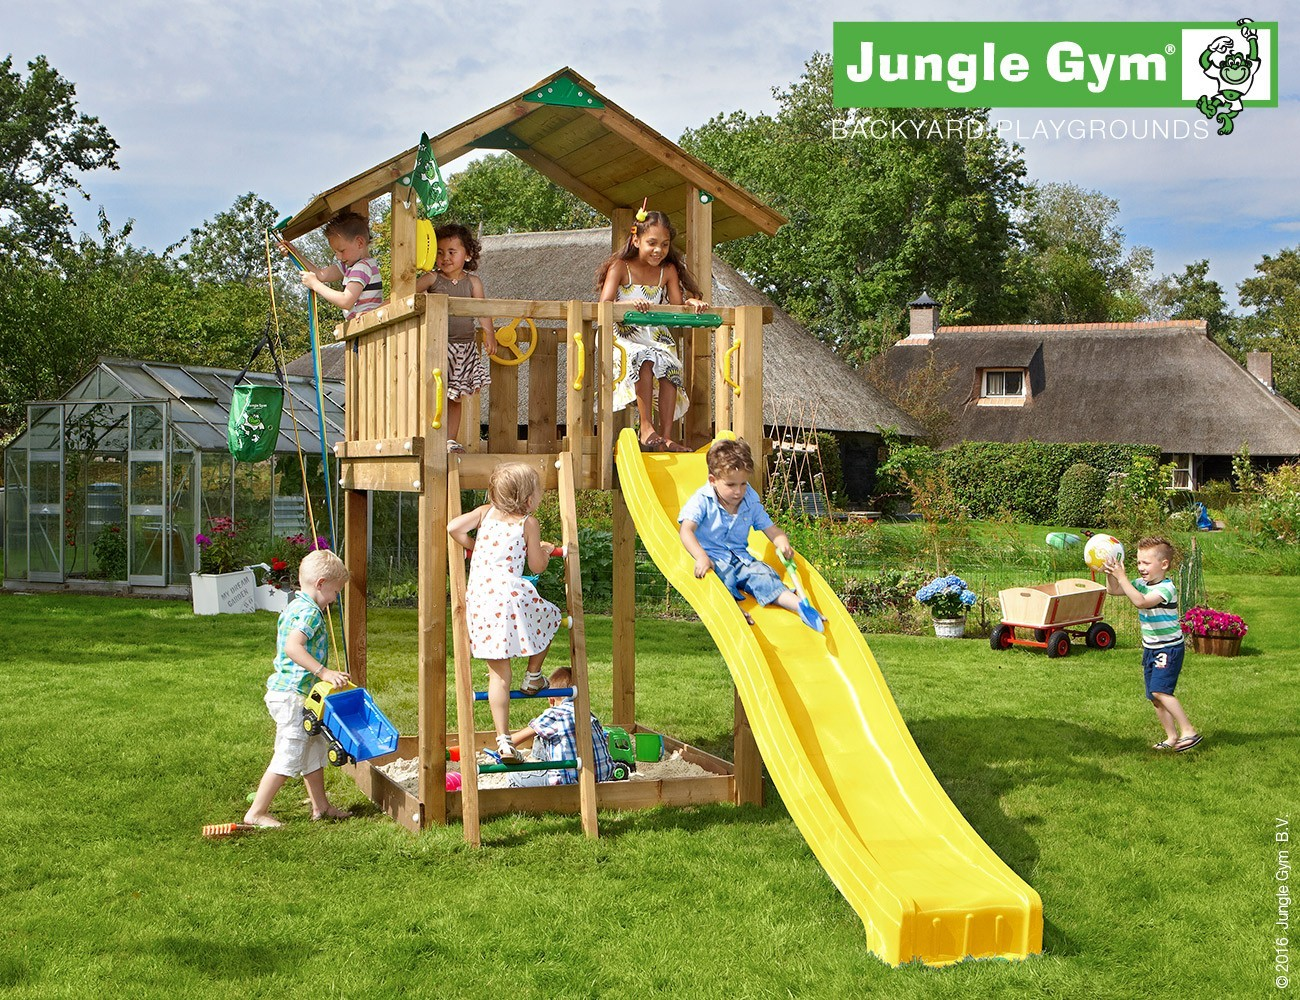 jungle gym spielturm chalet kletterturm mit rutsche aus. Black Bedroom Furniture Sets. Home Design Ideas